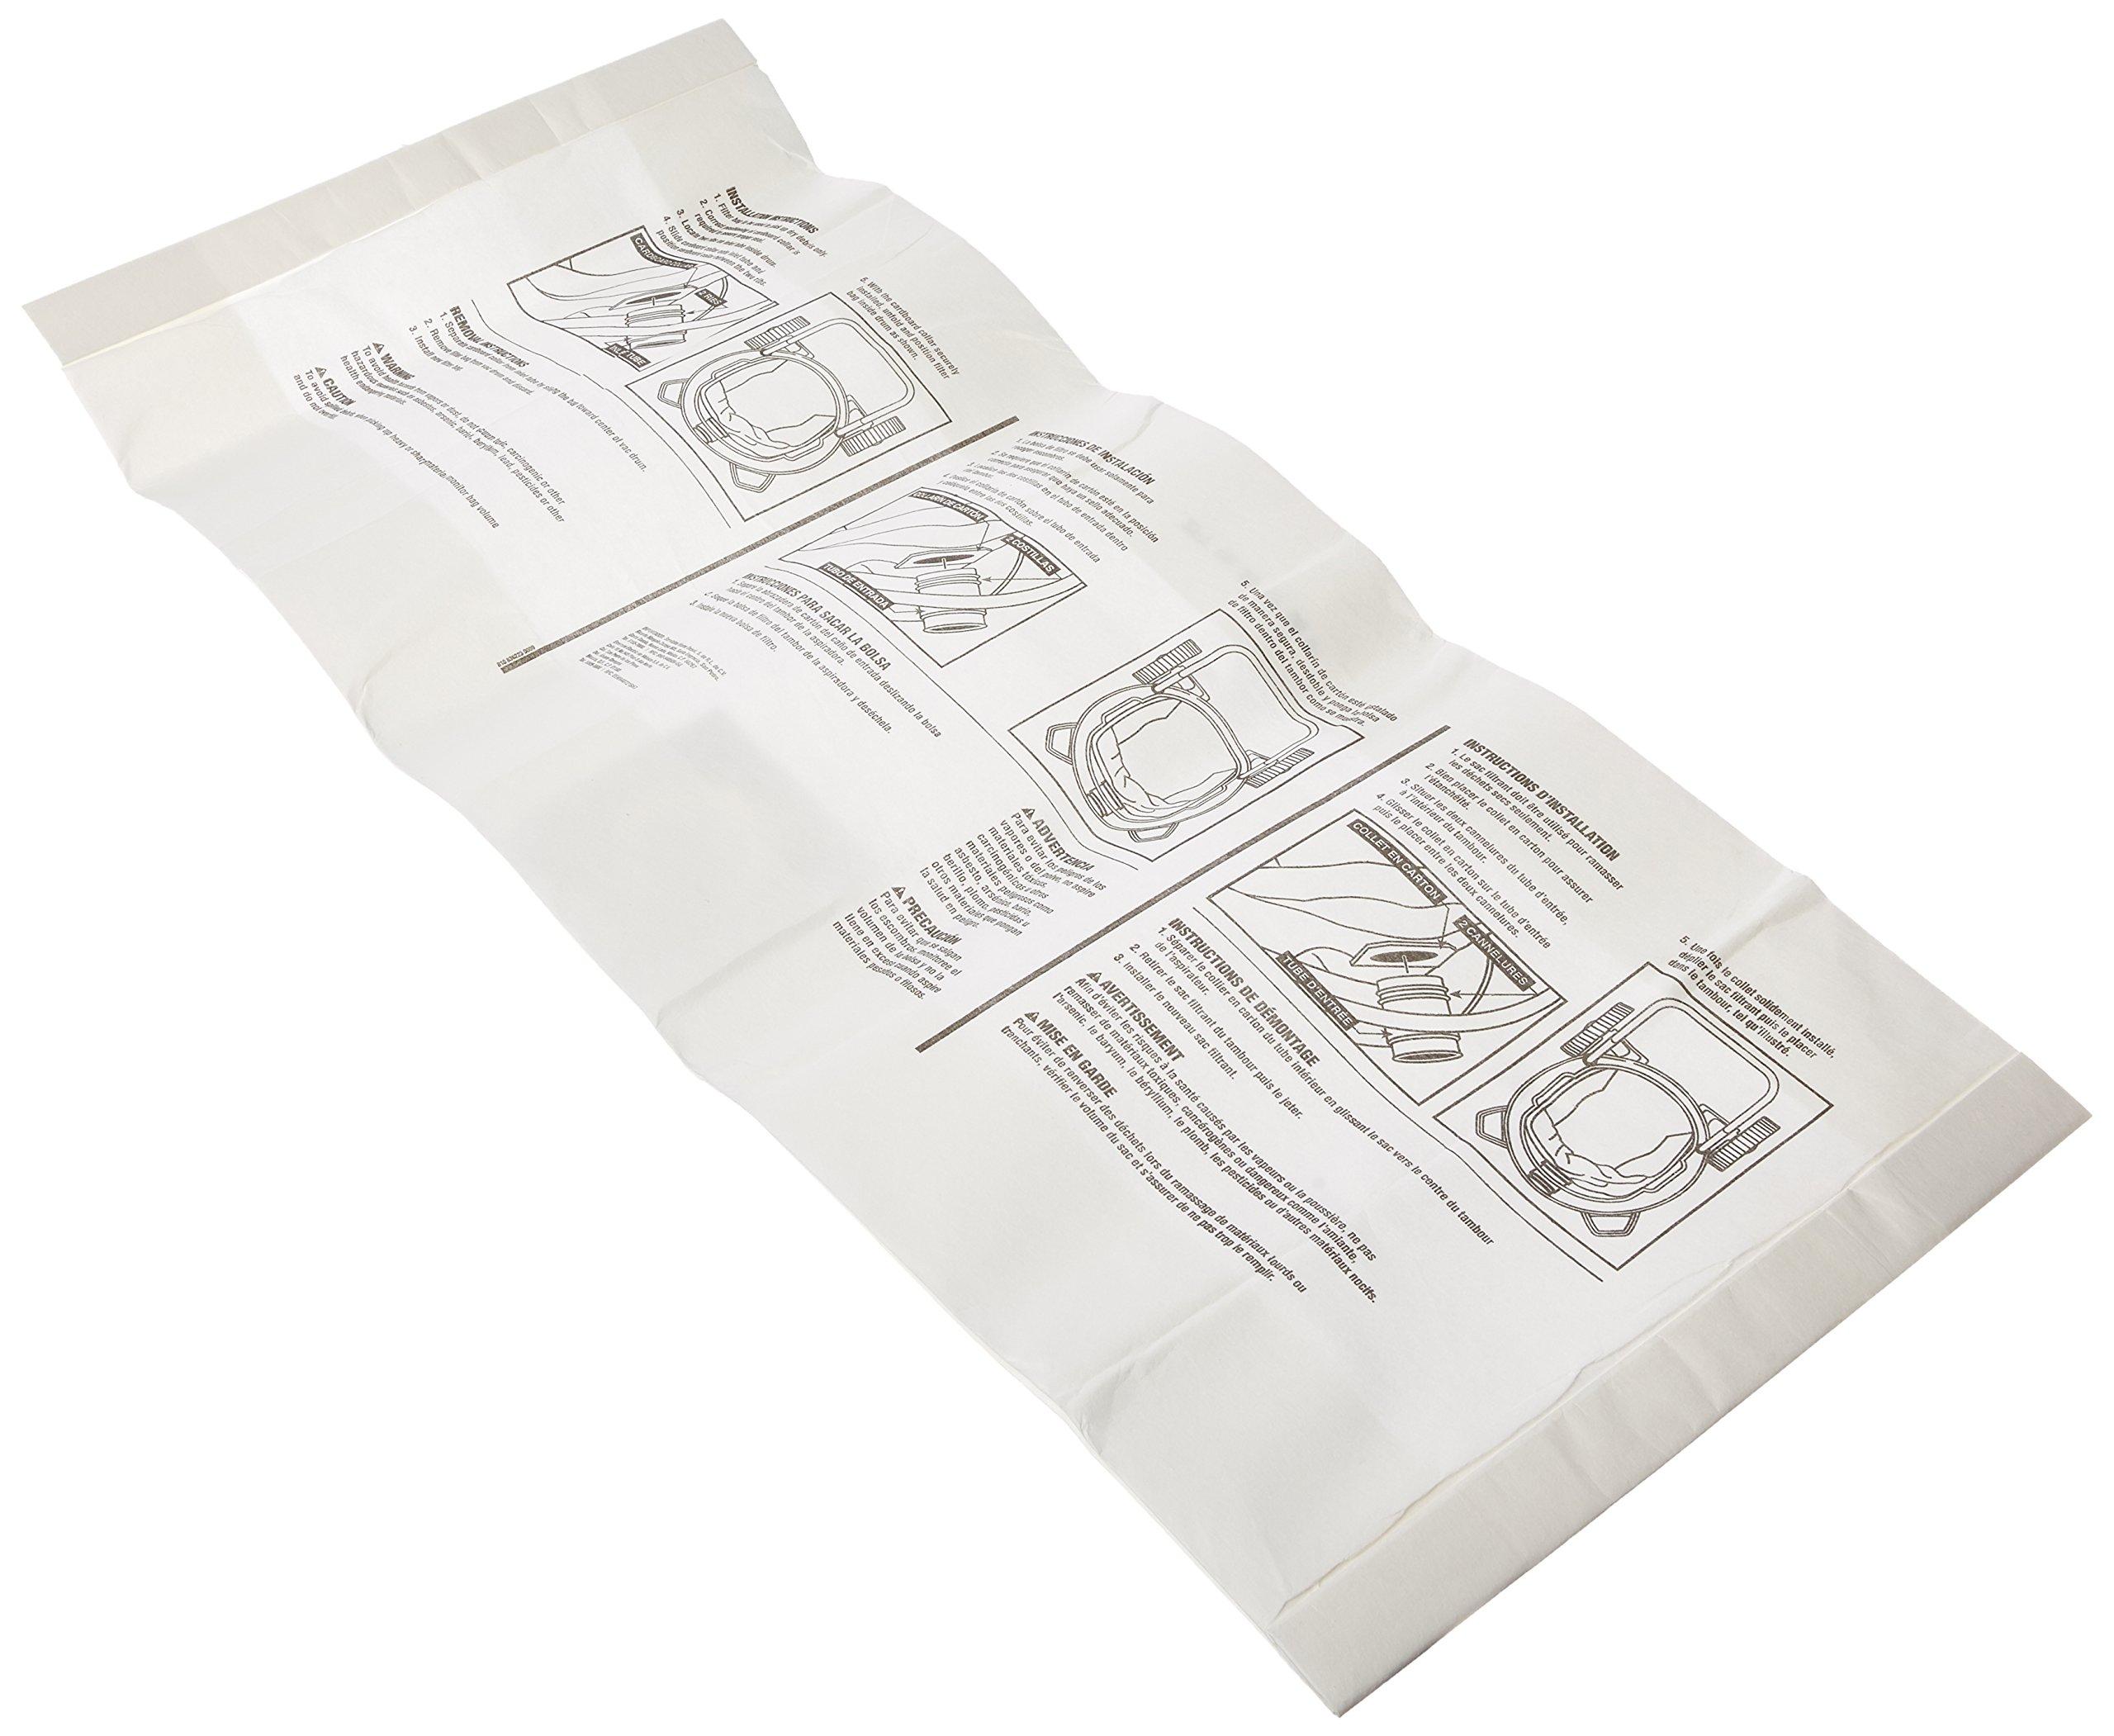 Ridgid VF3502 High Efficiency, Dry Pickup Dust Bags for 12 - 16 Gallon Ridgid Wet / Dry Vacuums (2 Pack) by Ridgid